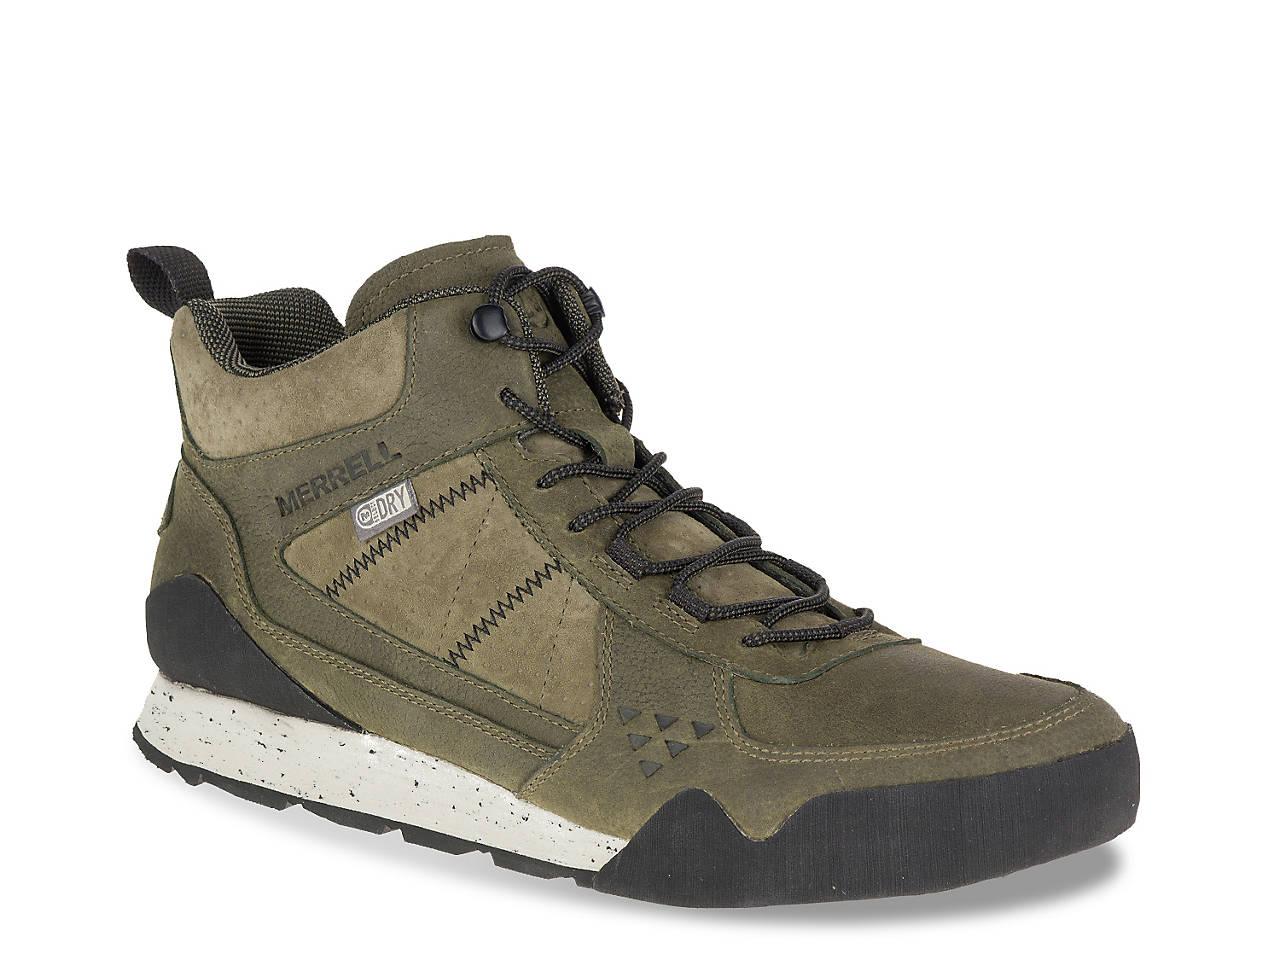 202bf99c71cfc Merrell Burnt Rock Hiking Boot Men's Shoes | DSW